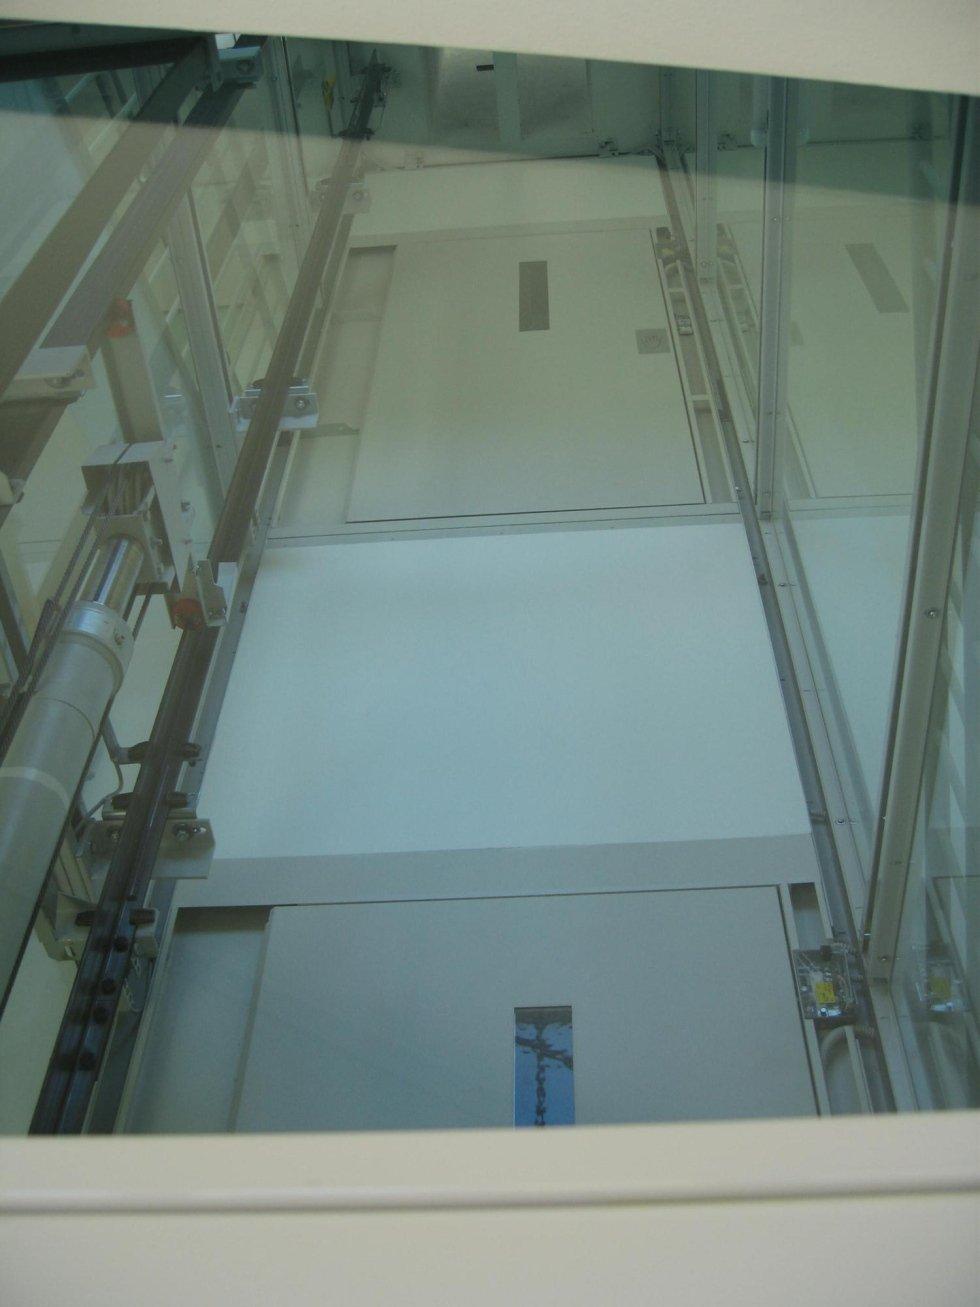 piattaforma elevatrice idraulica vista da basso